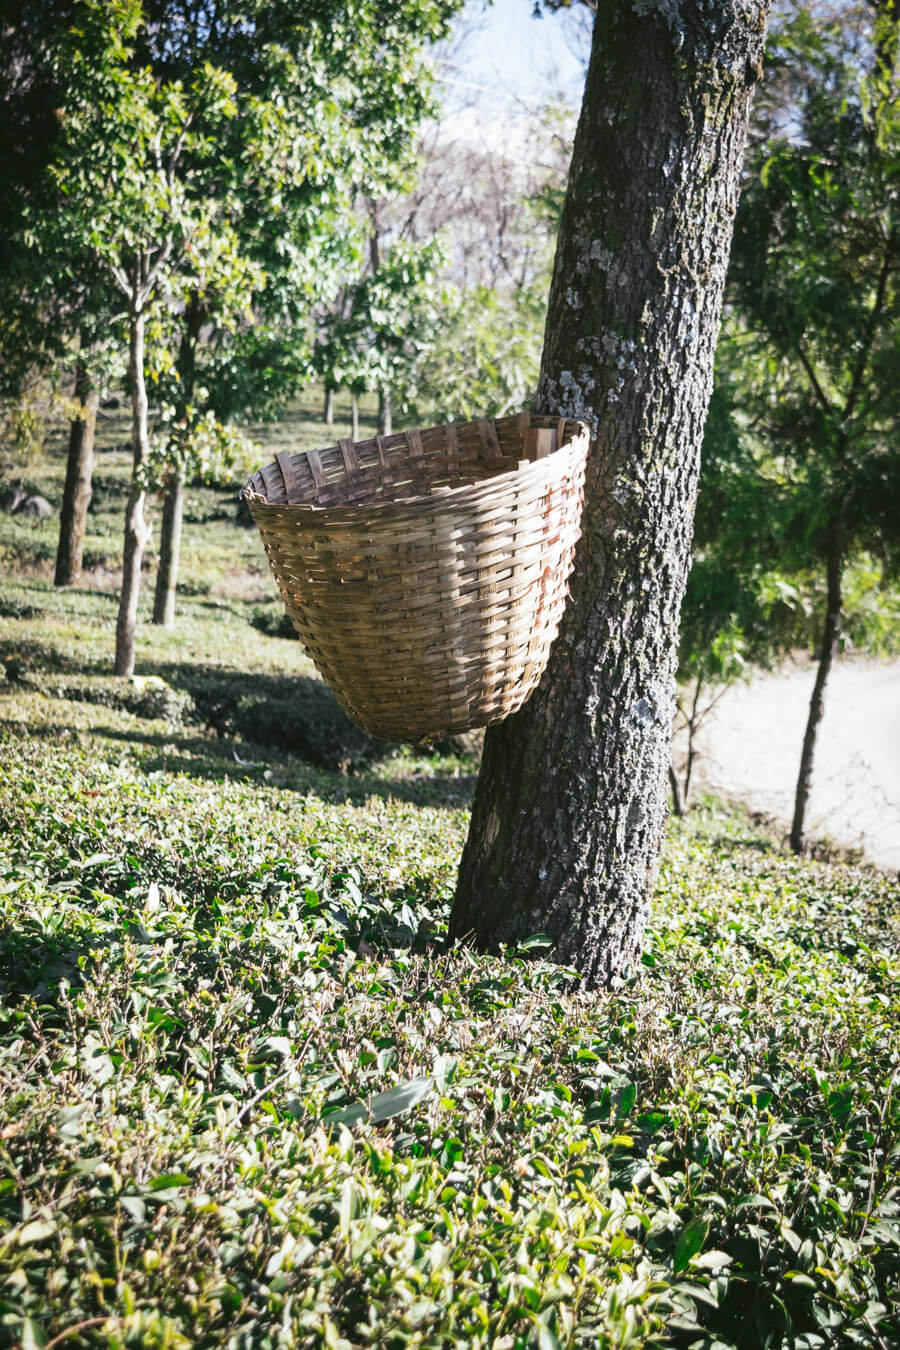 The Tea basket.